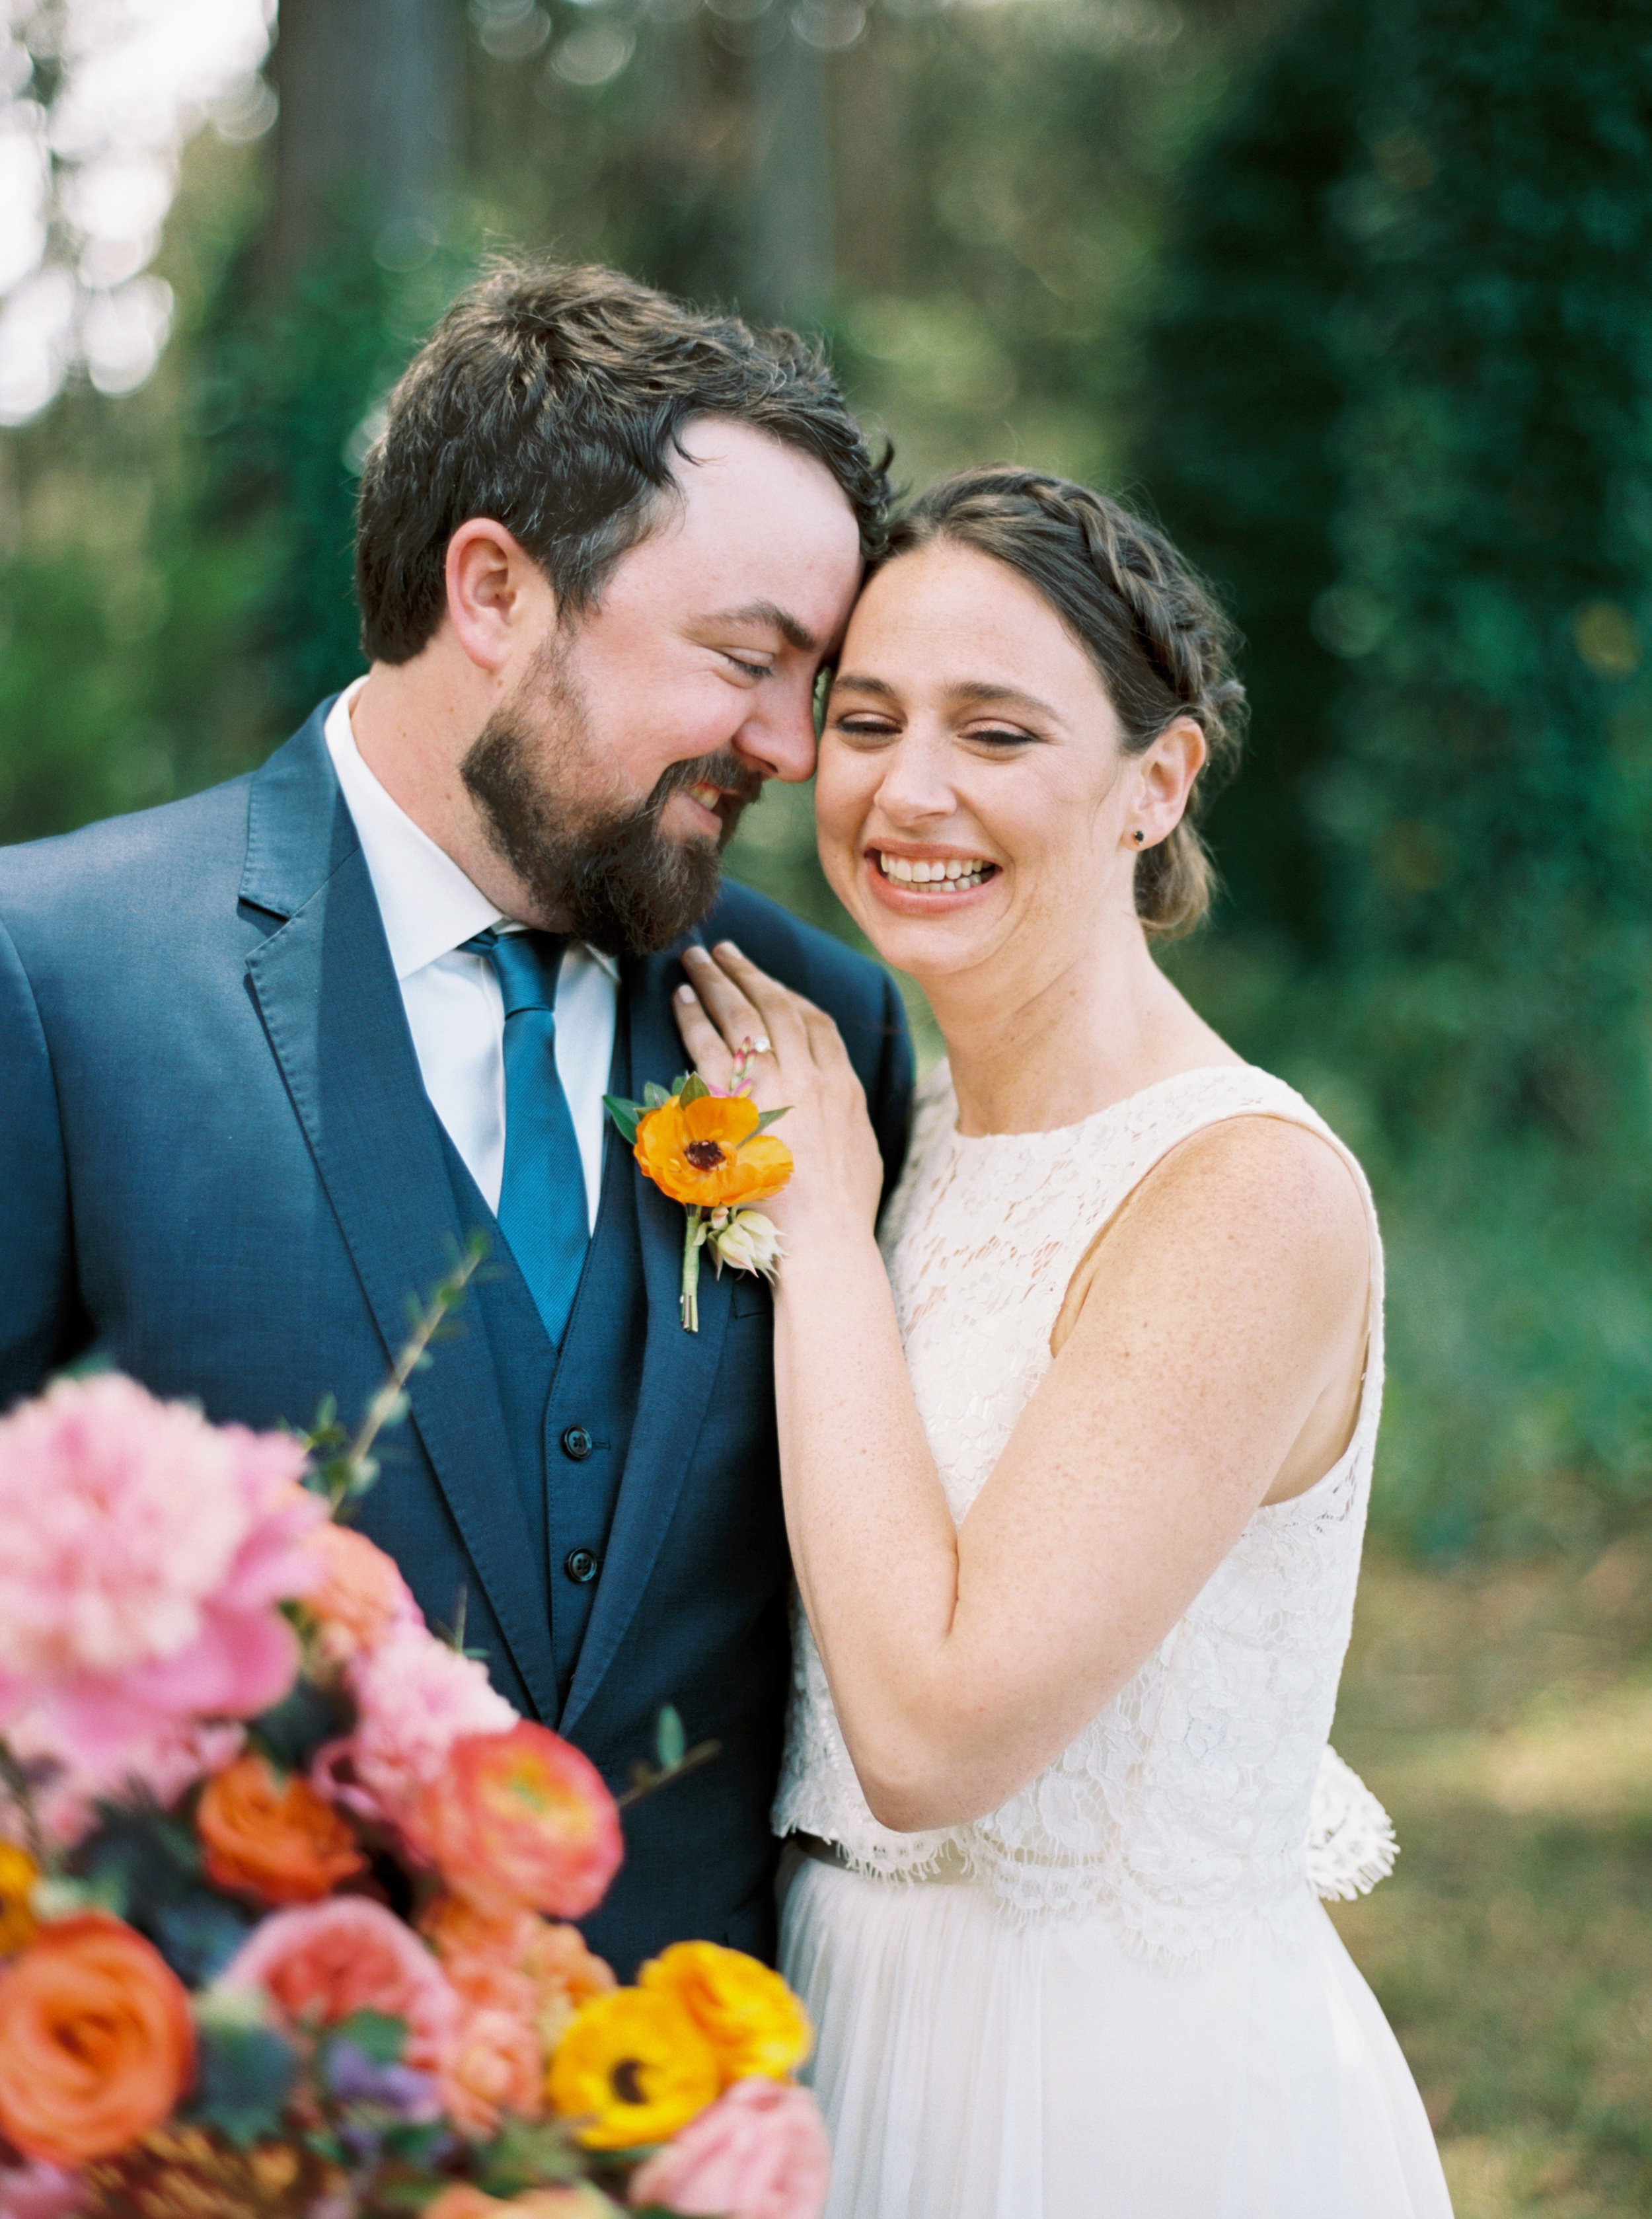 Tucker_Kristina_Wedding_Presidio_San_Francisco_Abigail_Malone_Photography-353.jpg